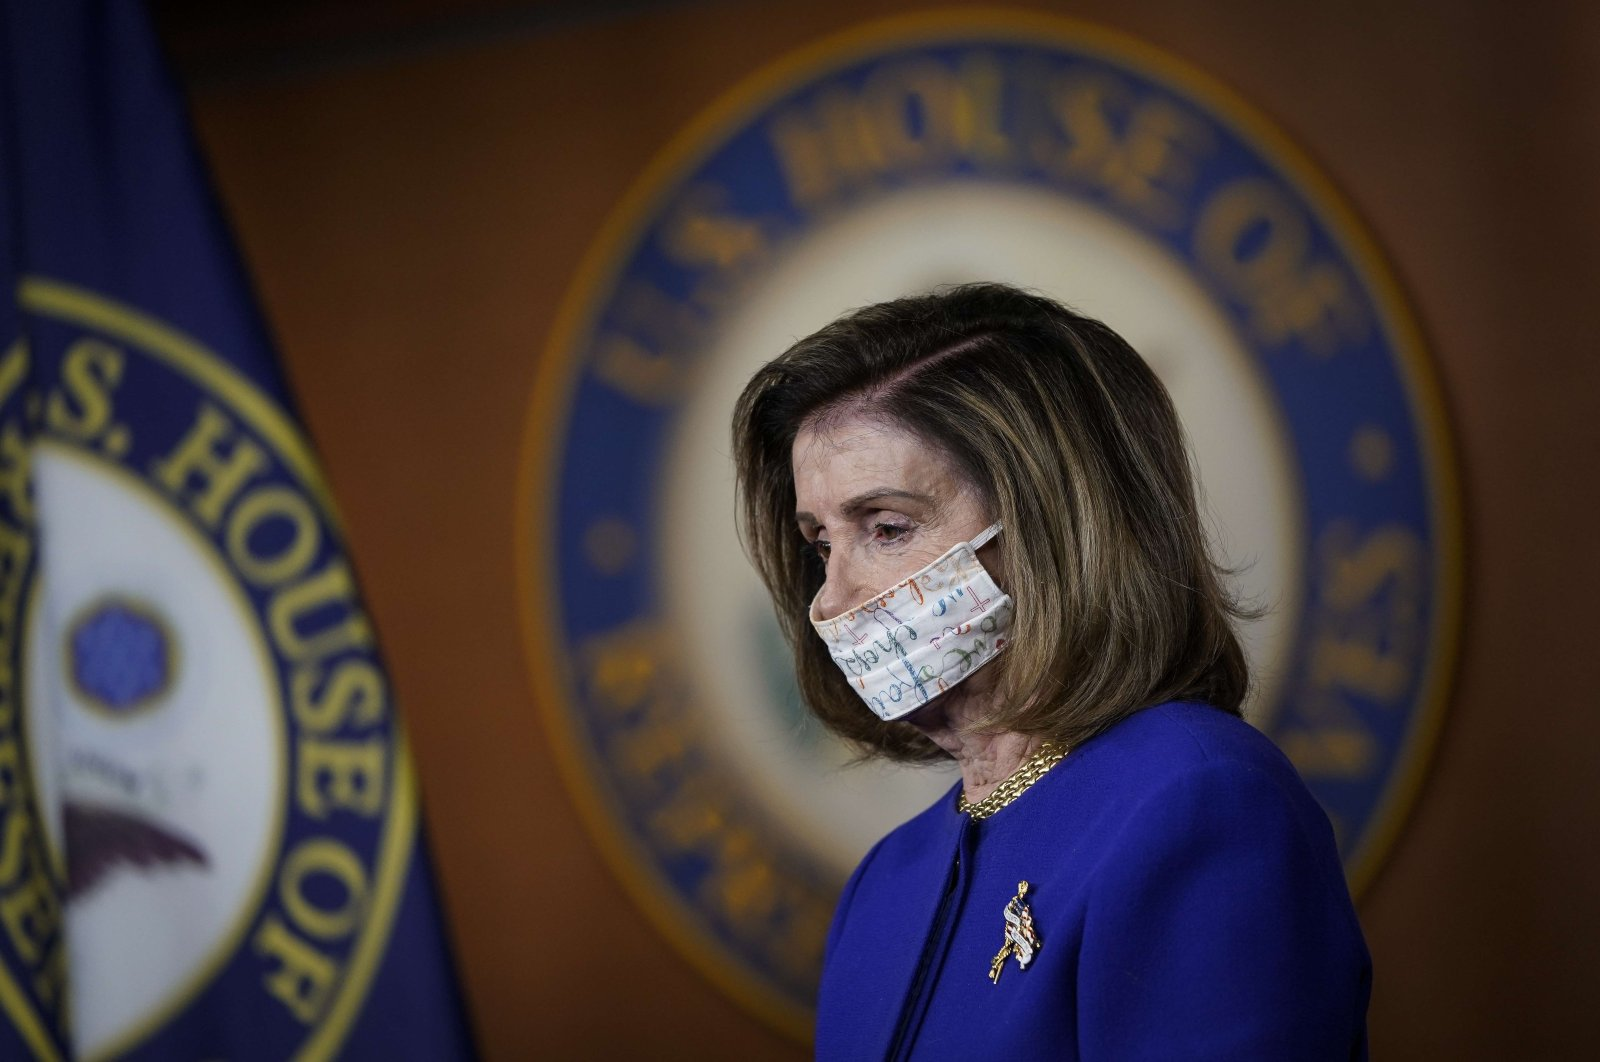 U.S. House Speaker Nancy Pelosi attends a news conference at the U.S. Capitol, Washington, D.C., Sept. 23, 2020. (AFP Photo)